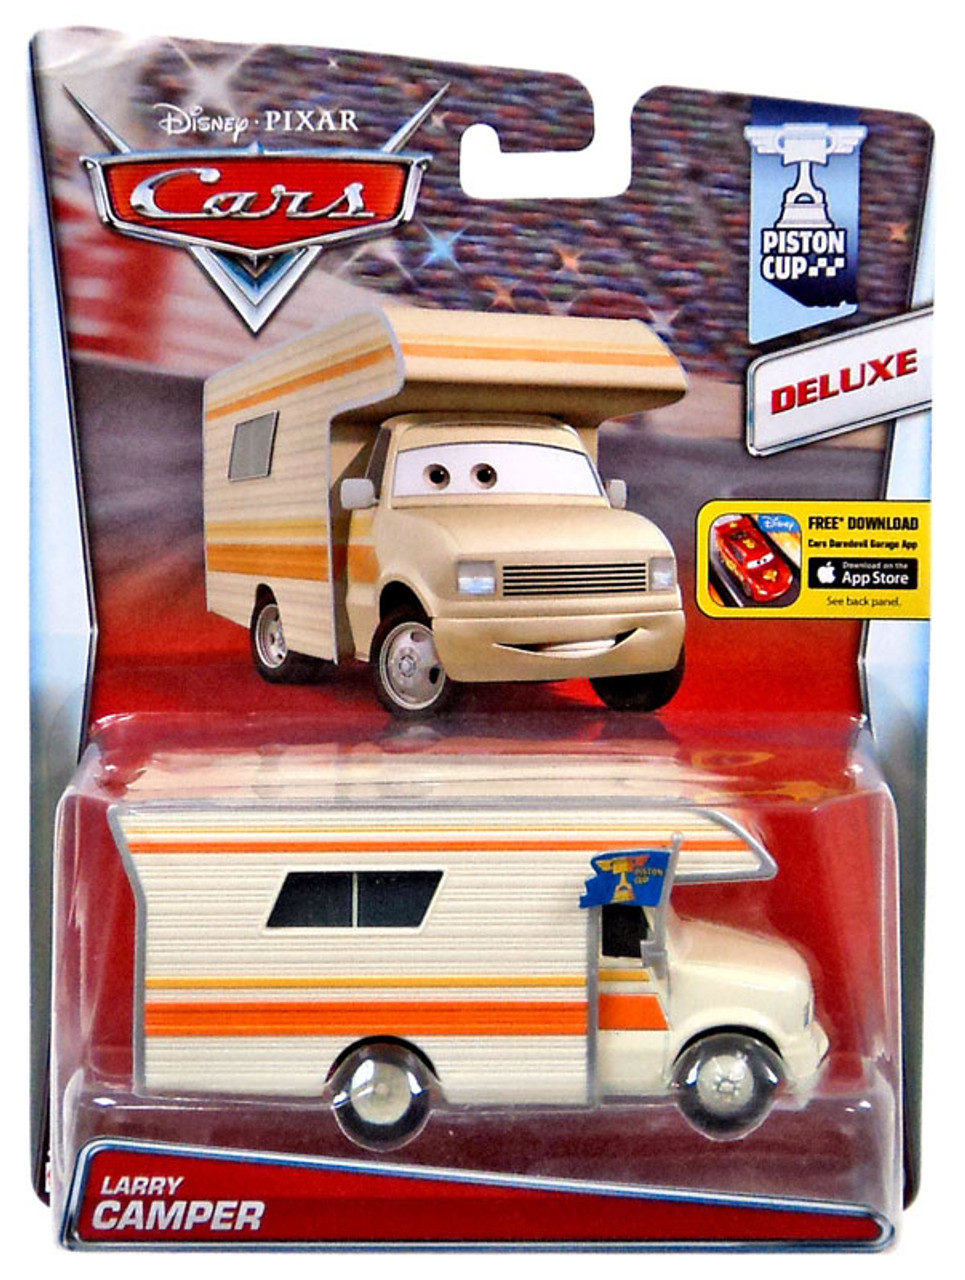 Disney / Pixar Cars Piston Cup Larry Camper Diecast Car #18/18